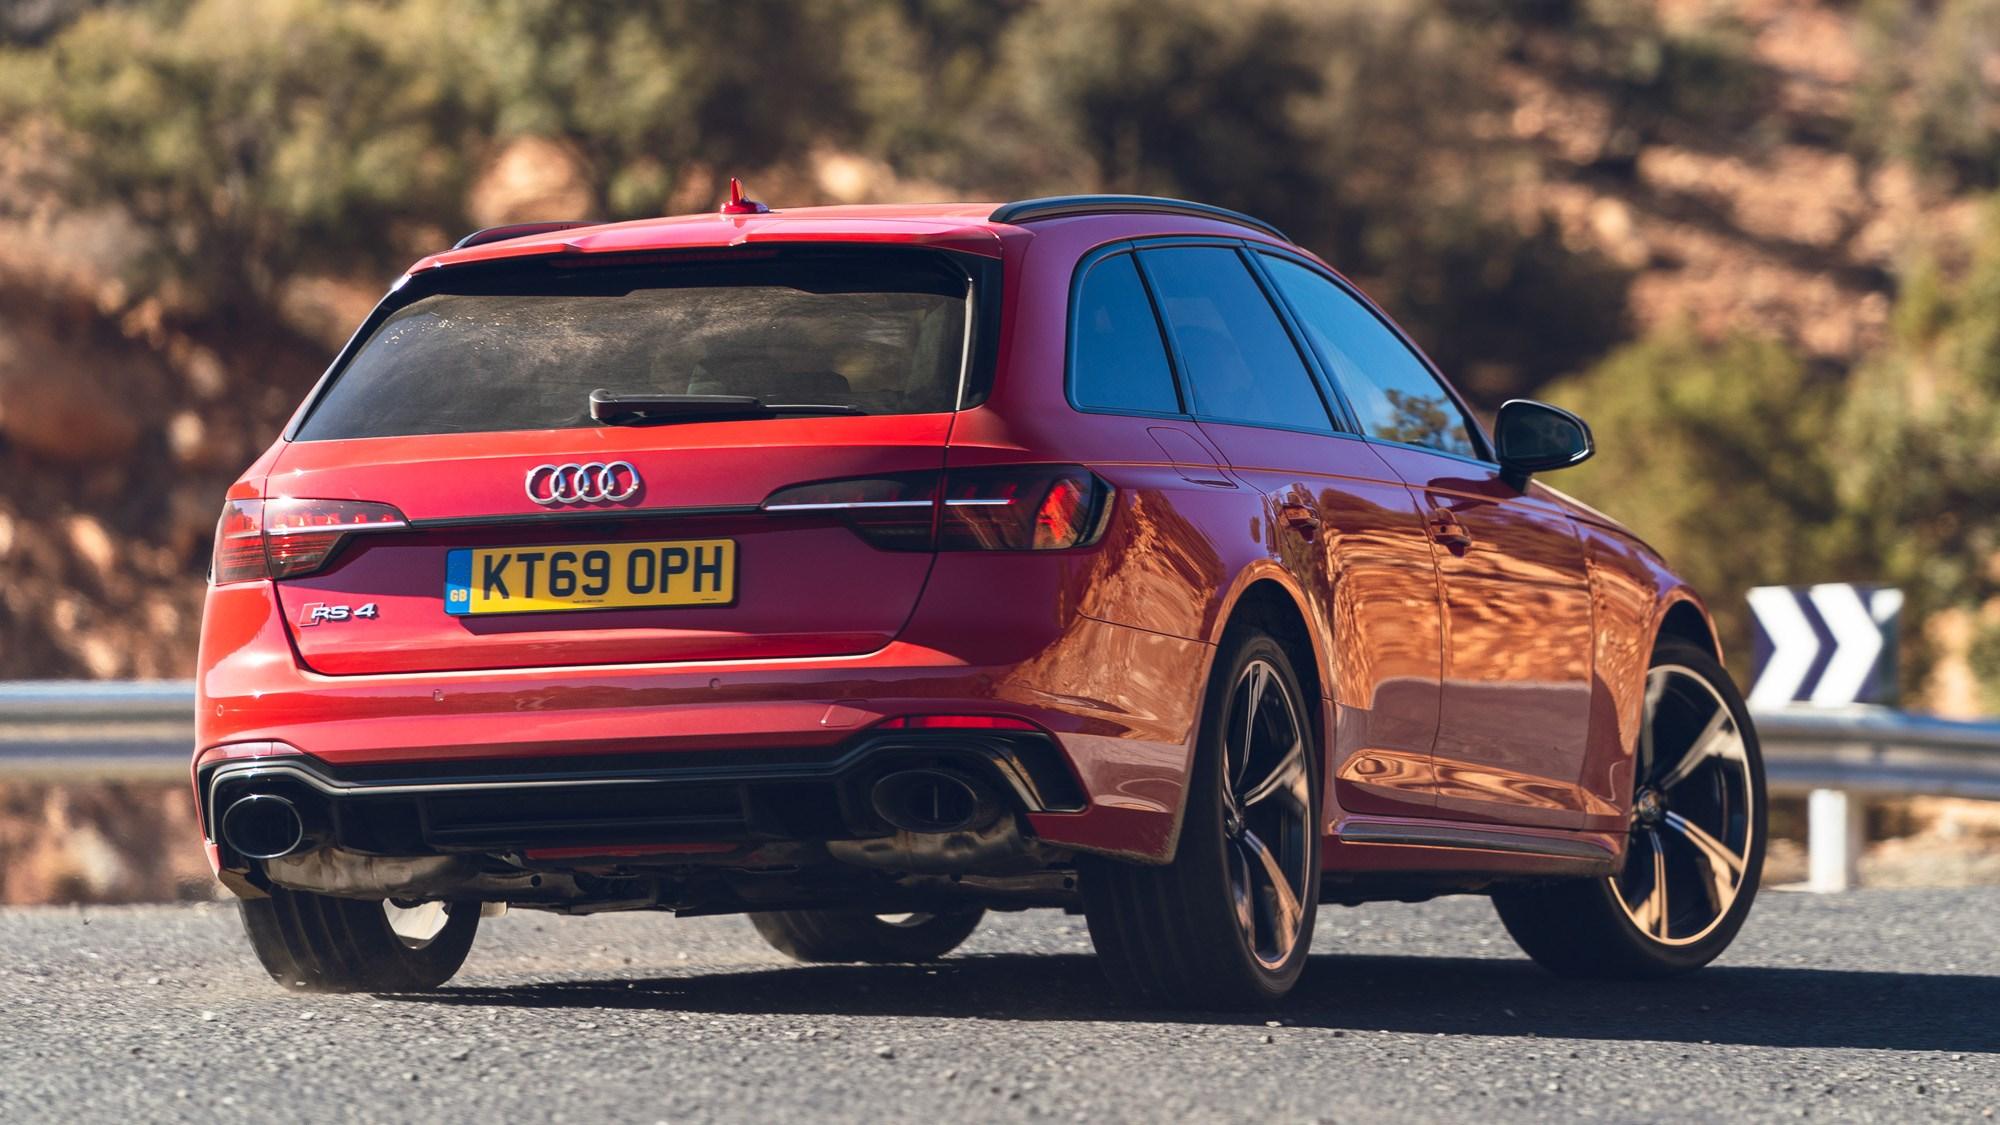 RS4 rear cornering